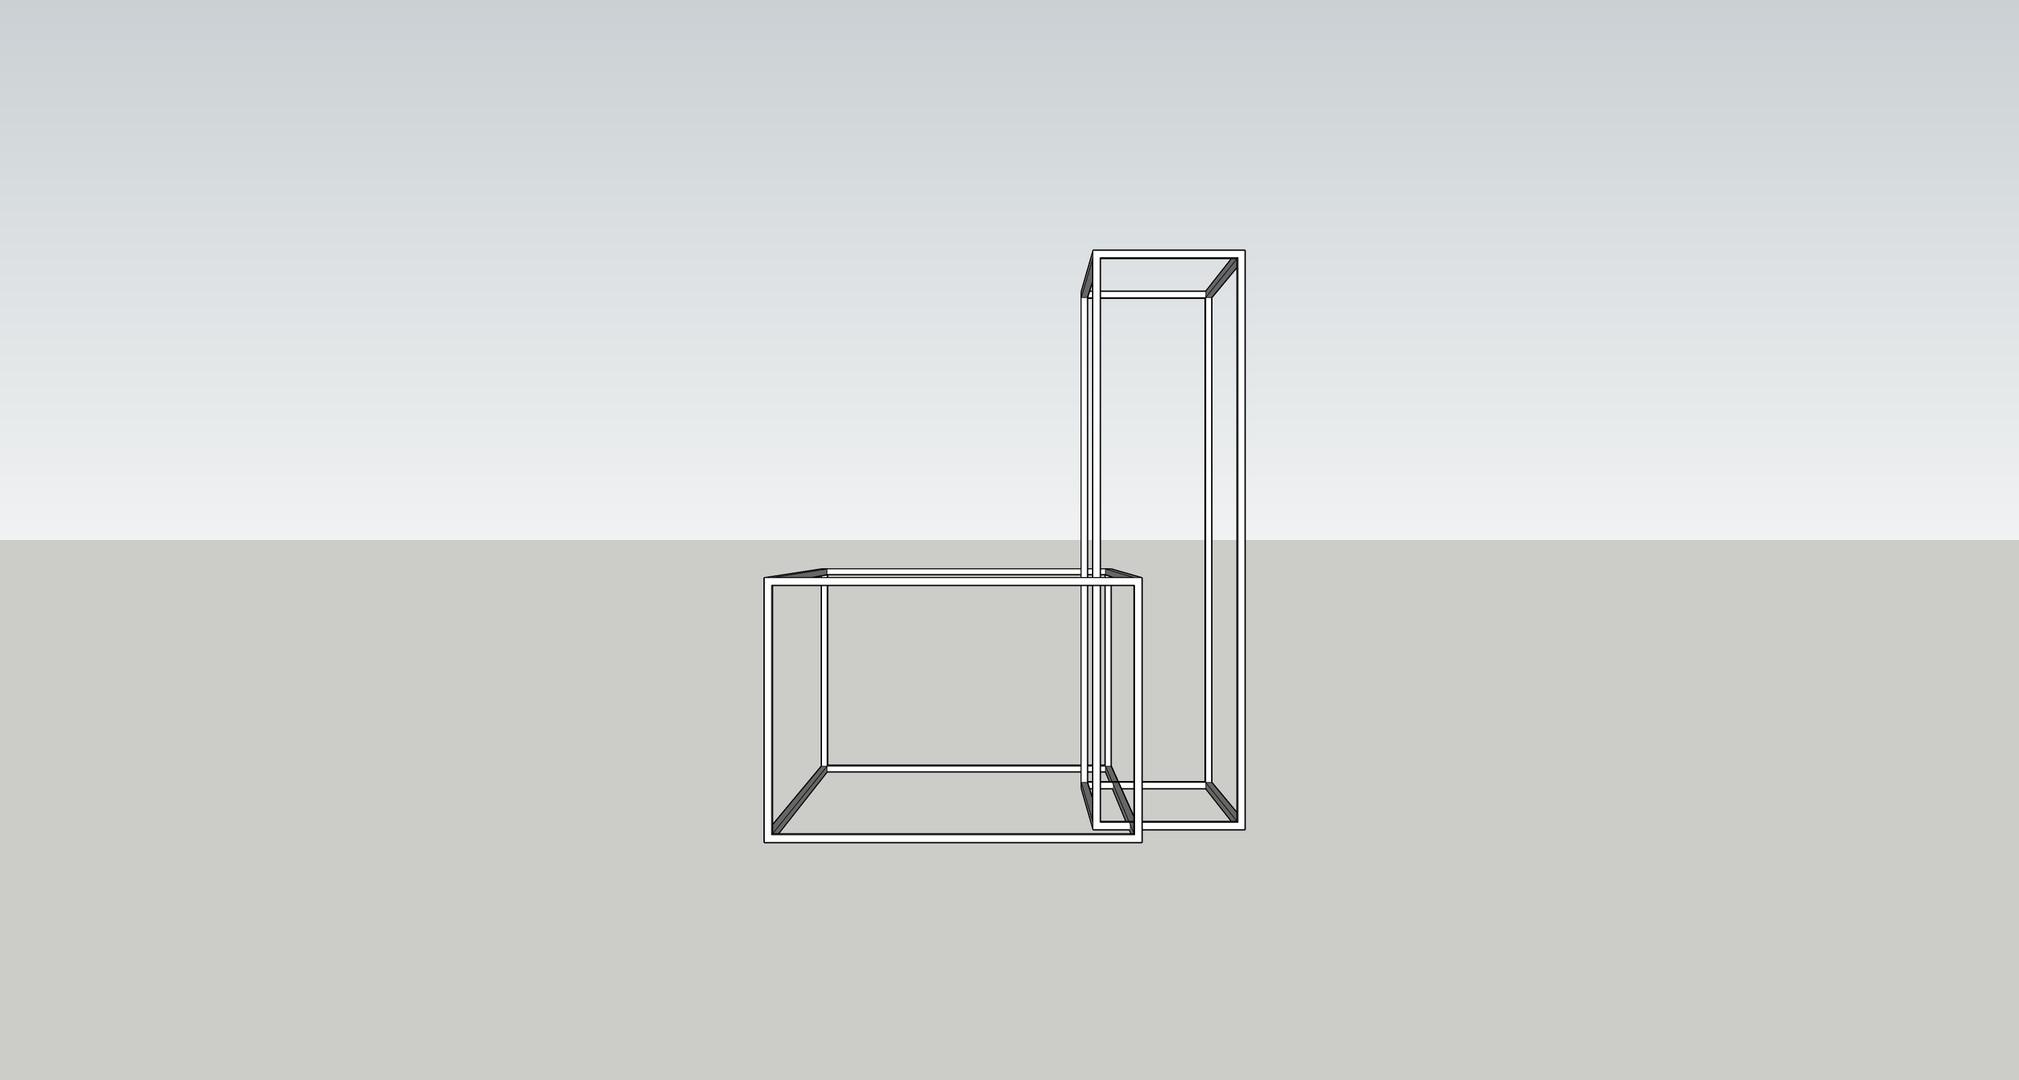 Final piece_perspective 2 (1).jpg